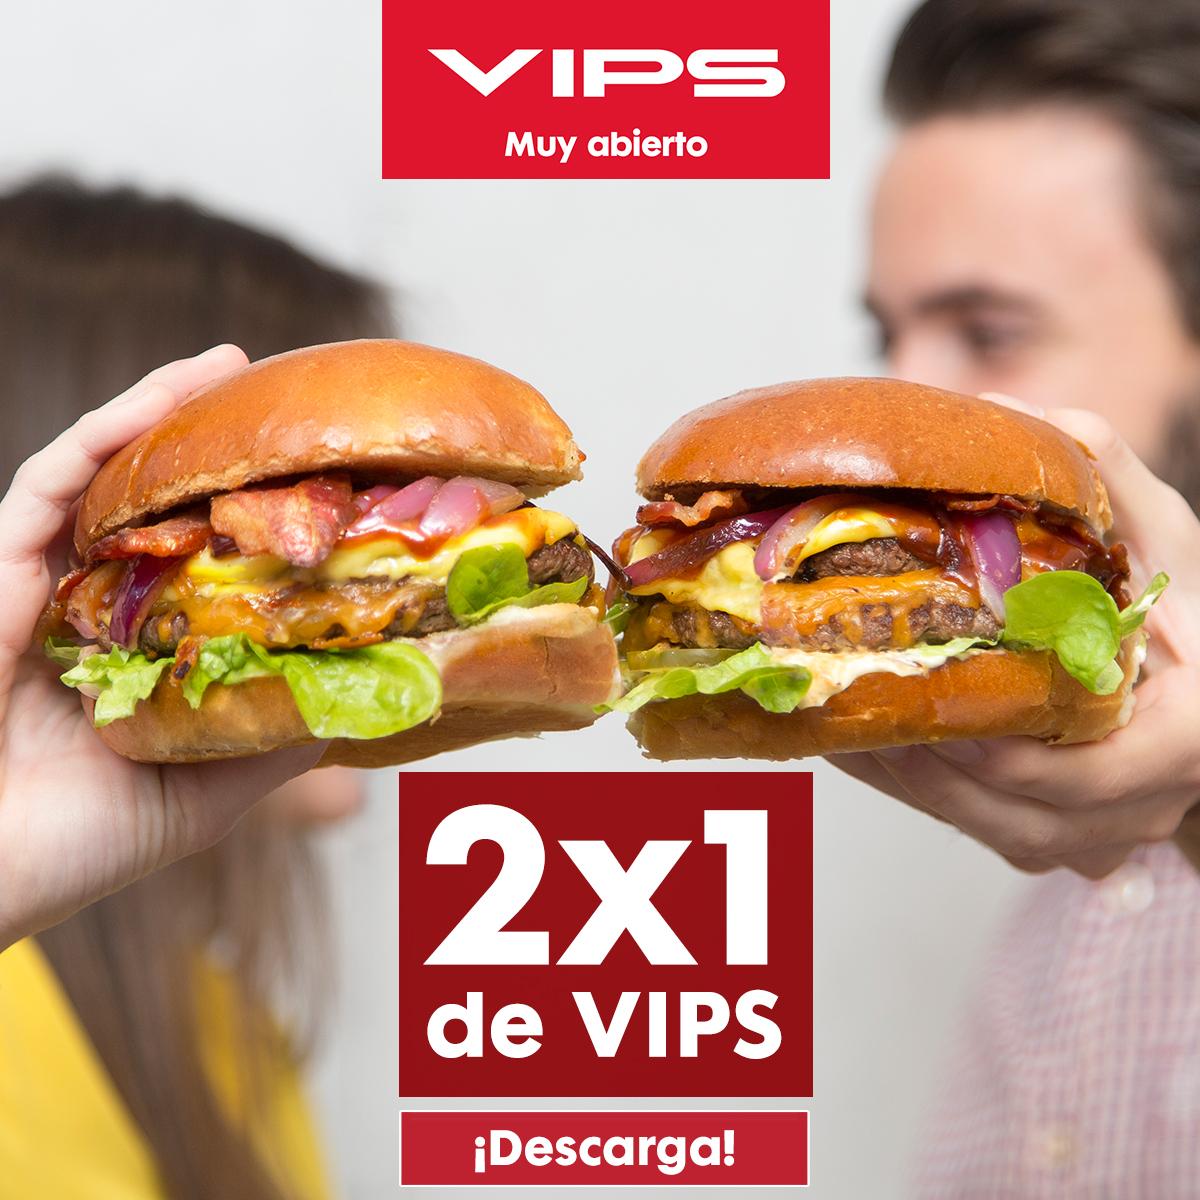 Cenas 2x1 de VIPS